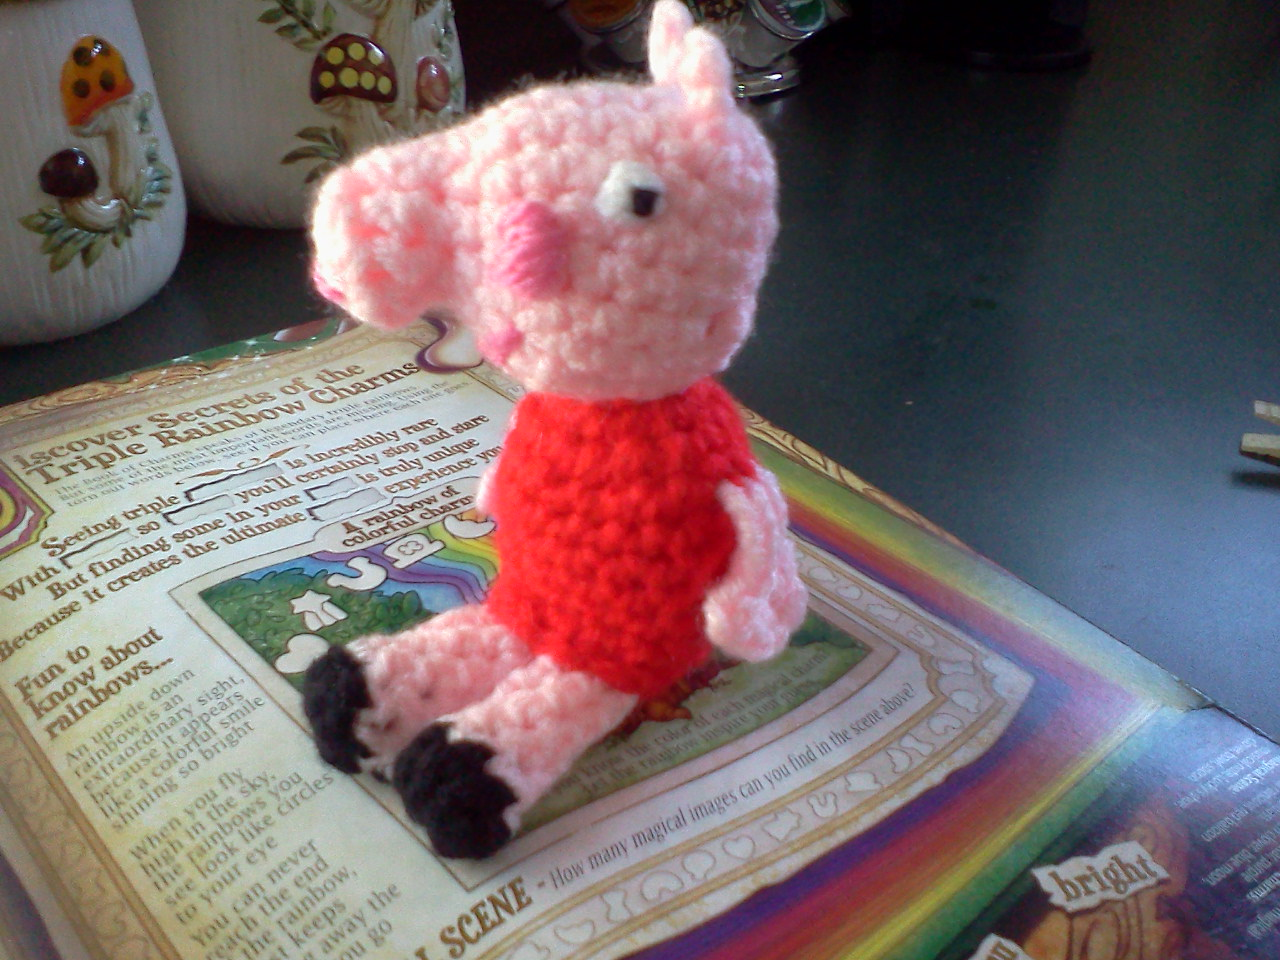 Peppa Pig Amigurumi Crochet : Serendipity Creative: Peppa Pig Amigurumi Crochet Doll ...